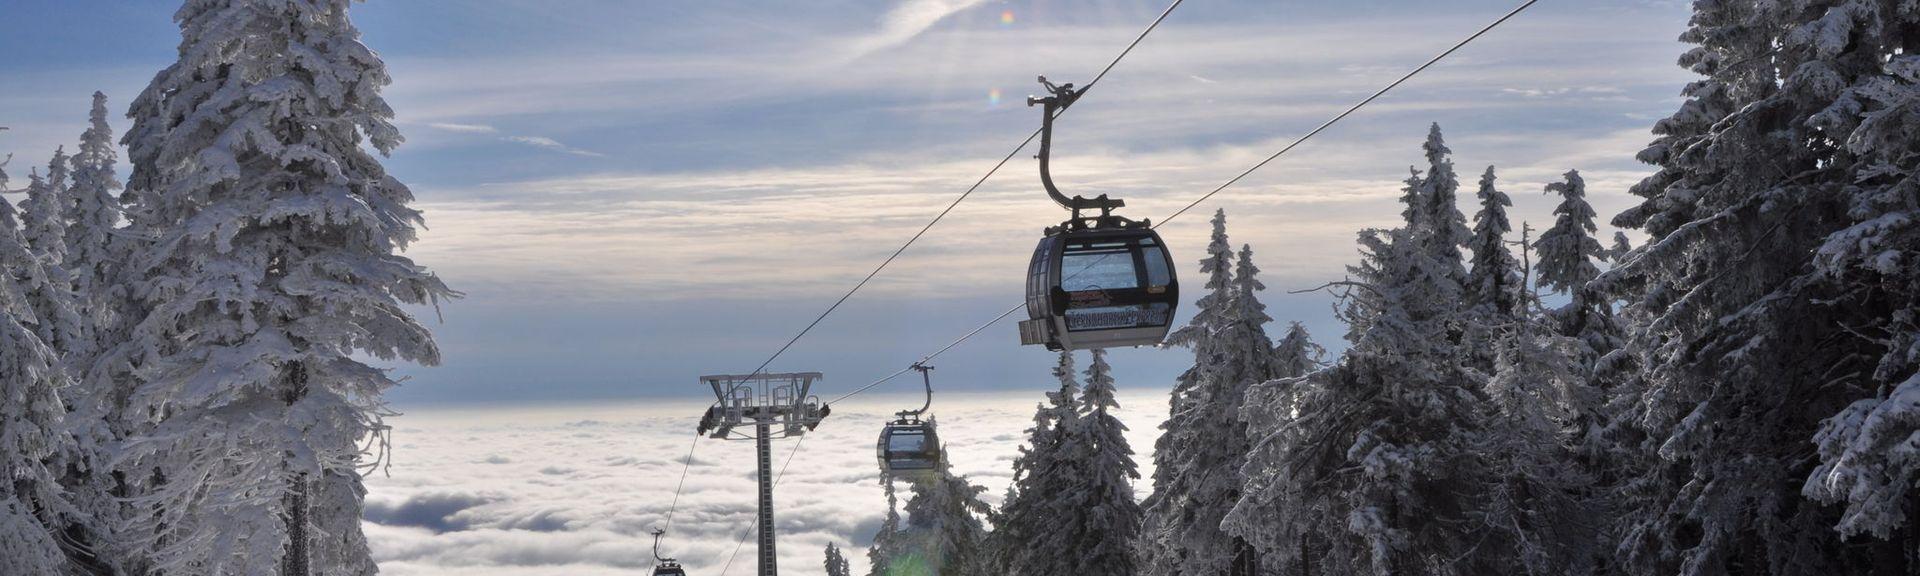 Okres Semily, Liberec (regio), Tsjechië